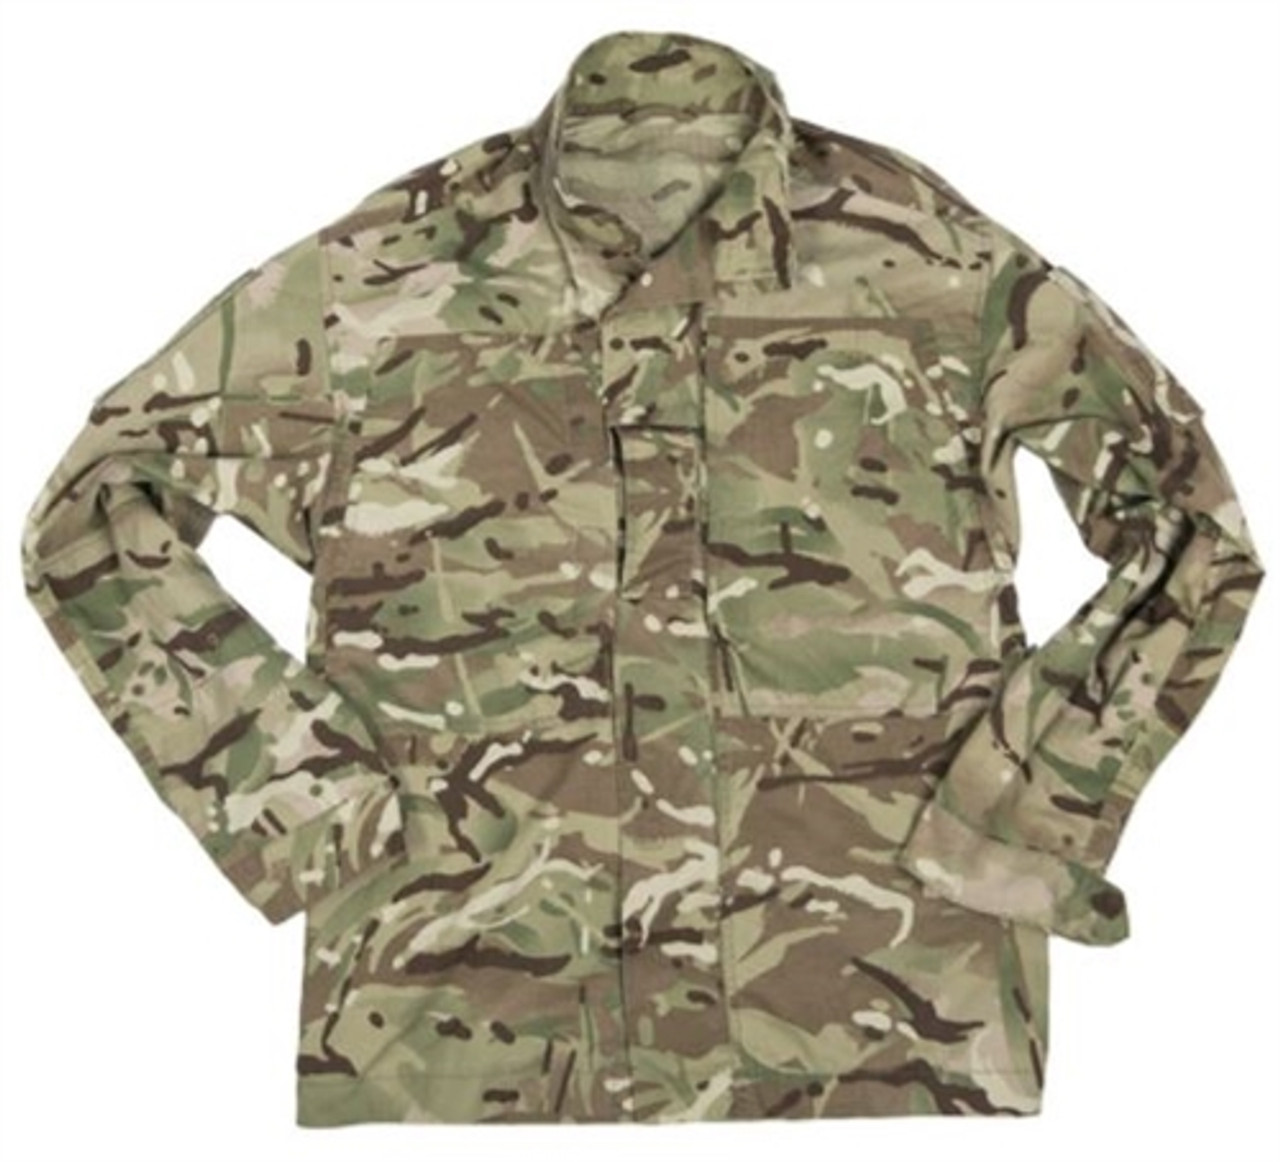 British MTP Camo Field Jacket  from Hessen Antique Militaria